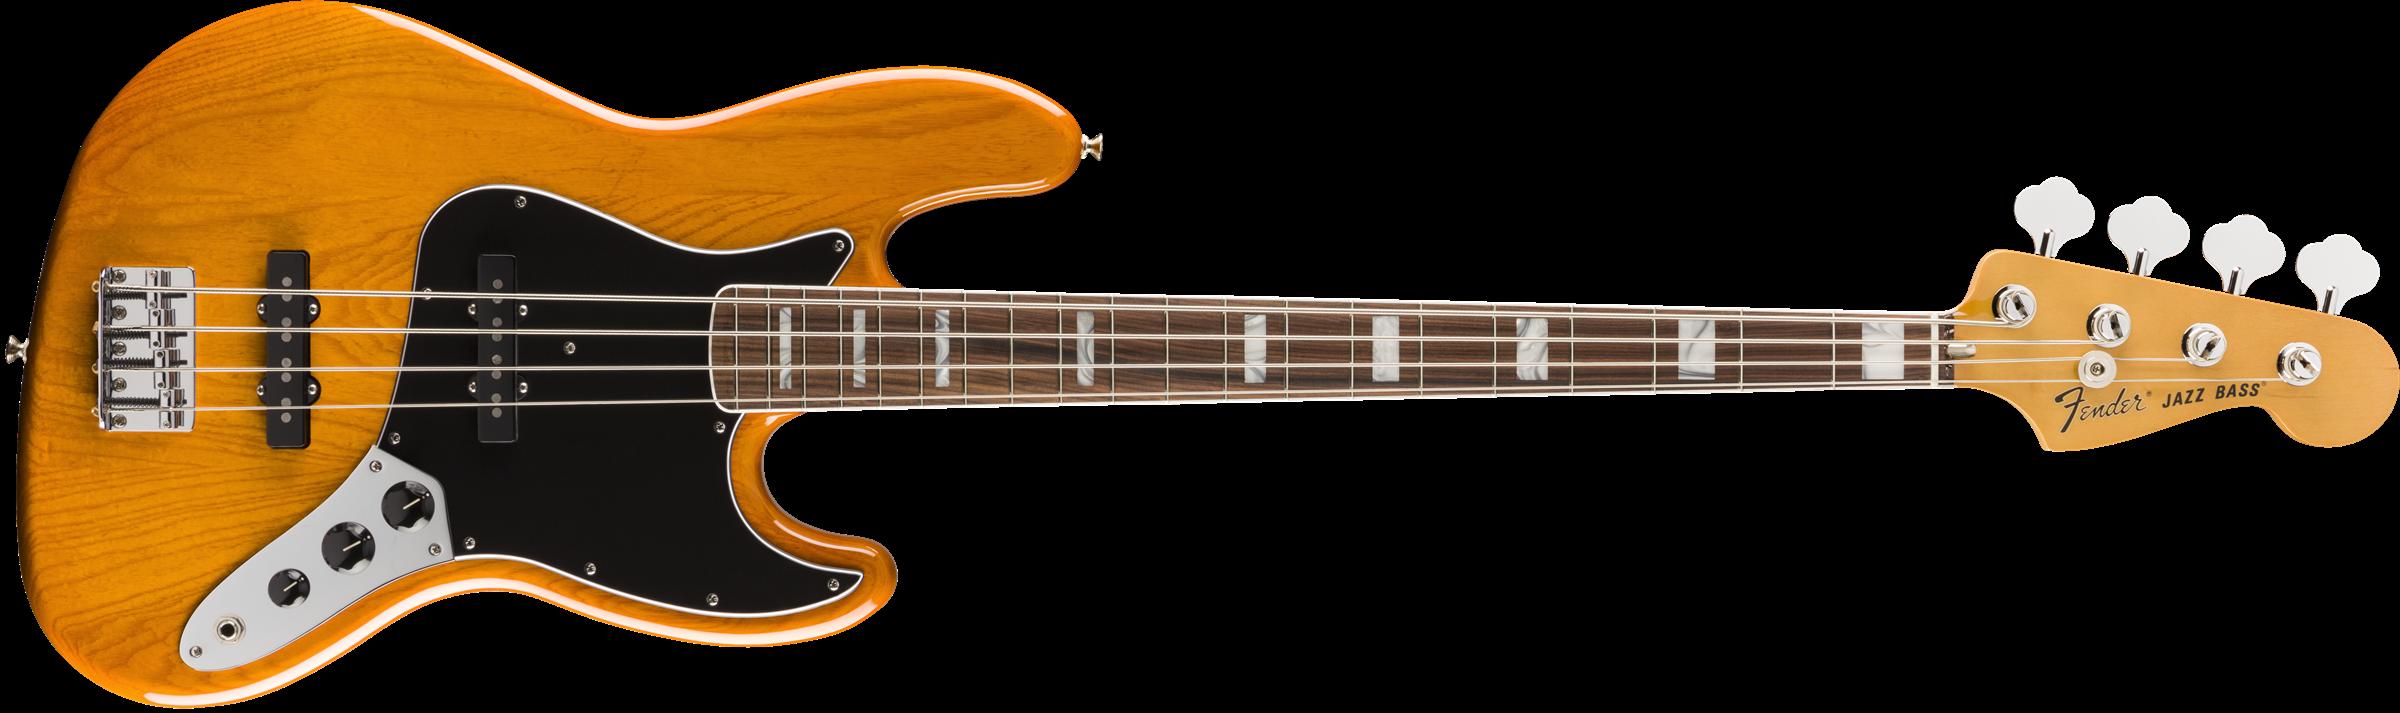 Fender Vintera Jazz Bass 70 PF Aged Natural